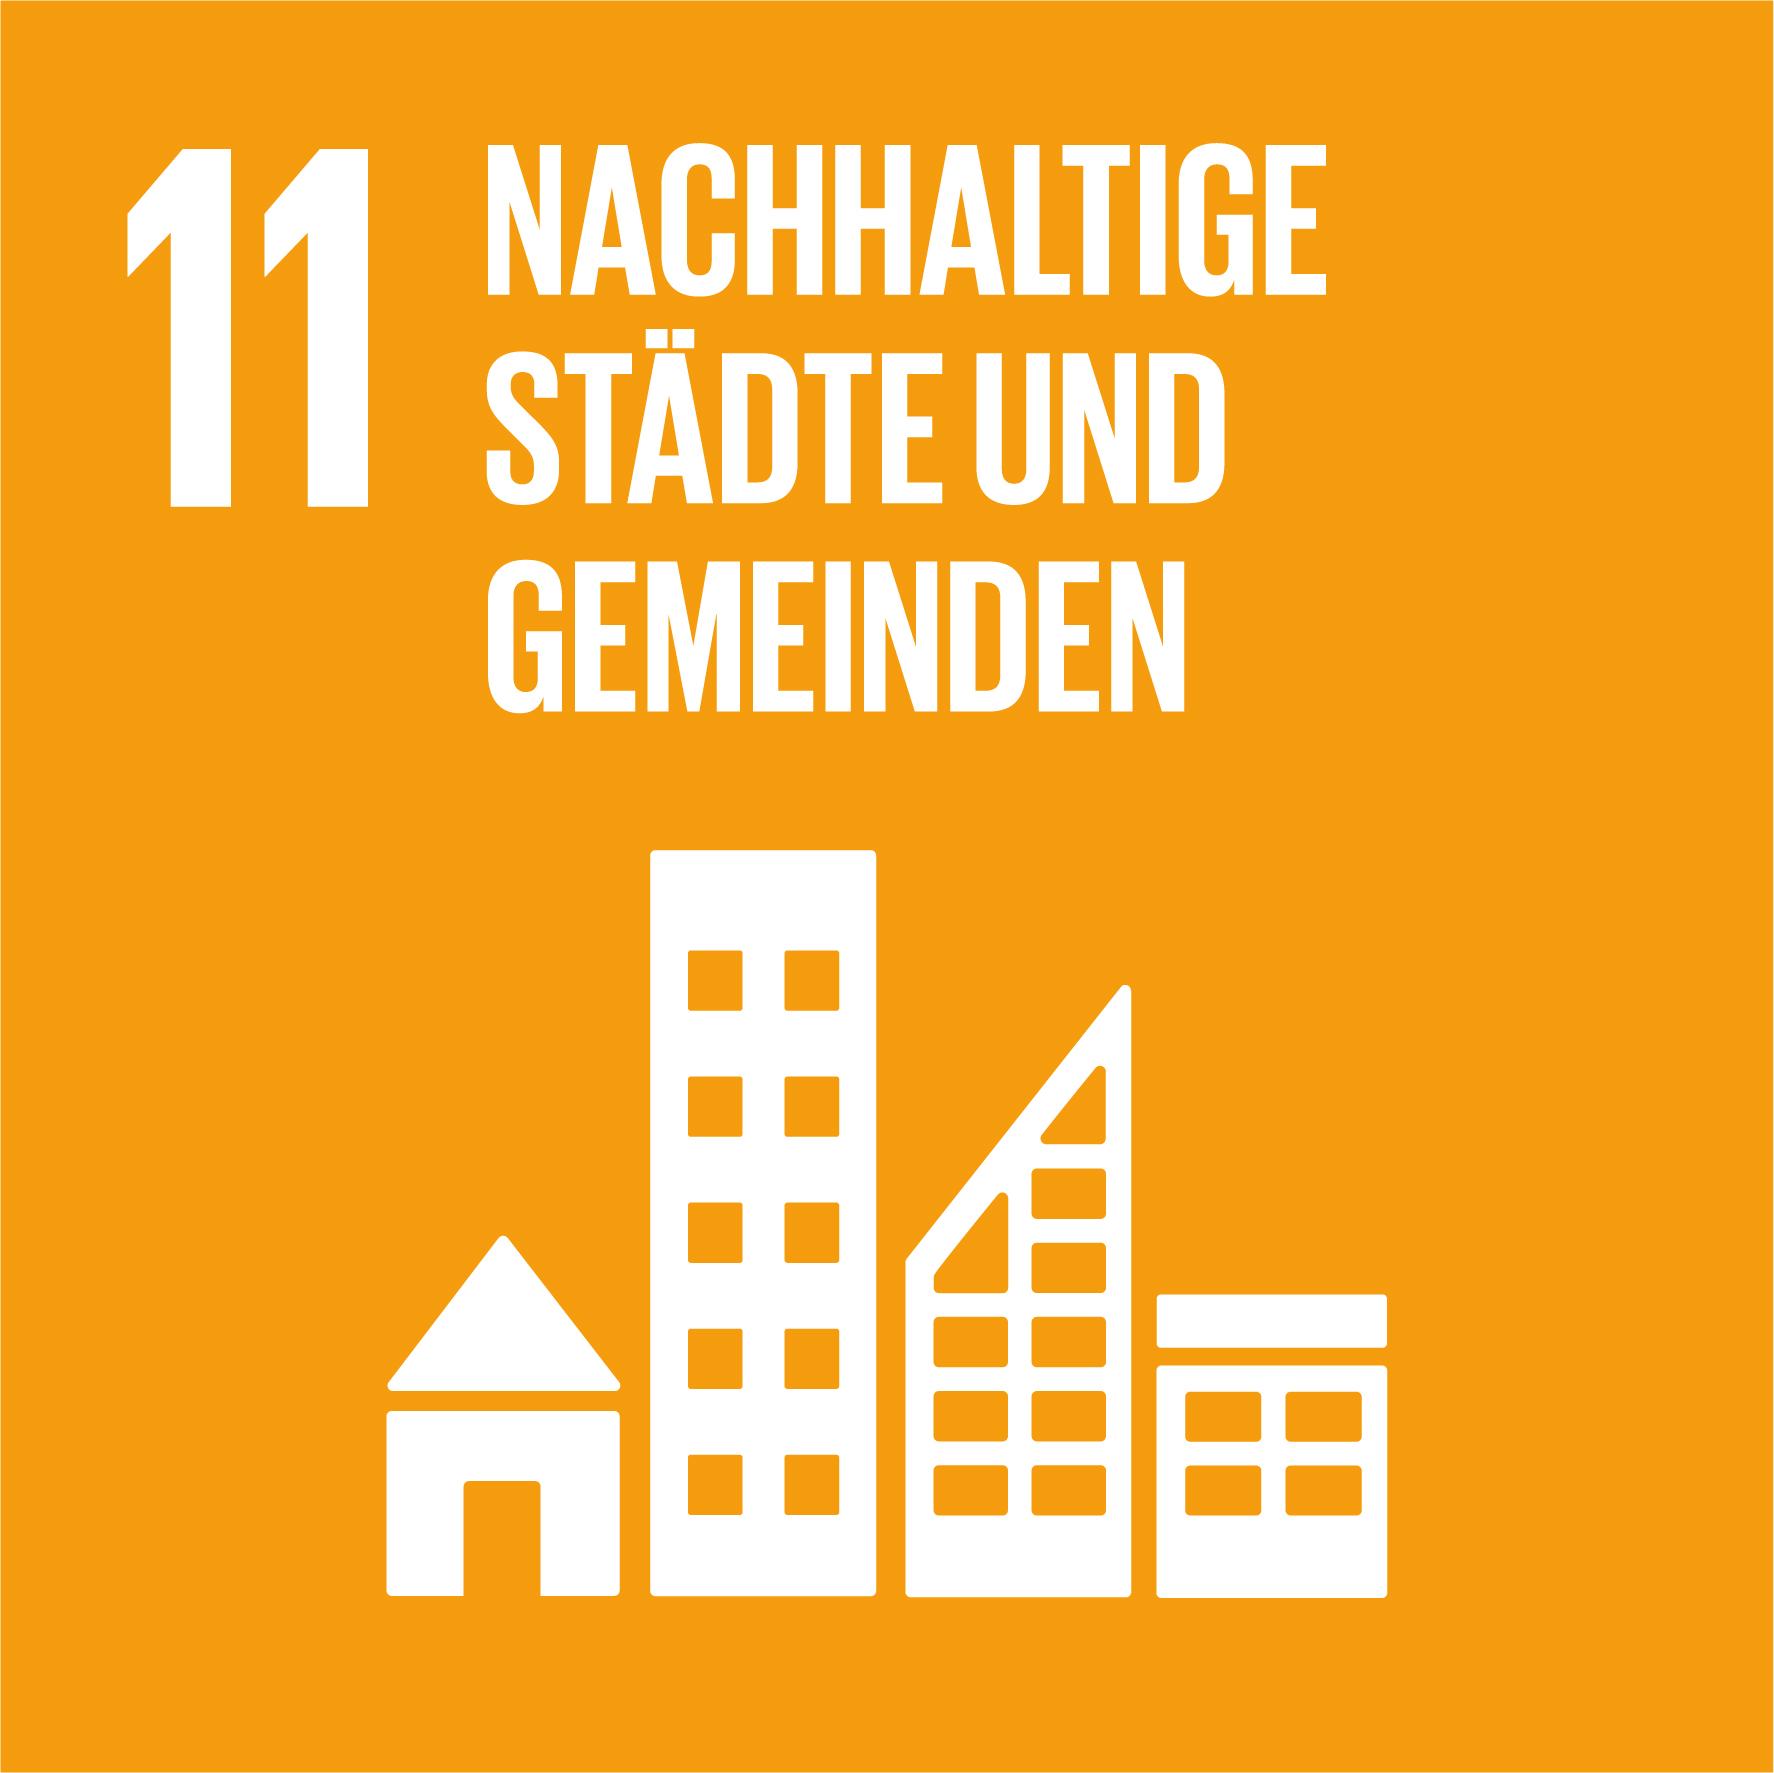 Regensburger_Nachhaltigkeitswoche_SDG_11